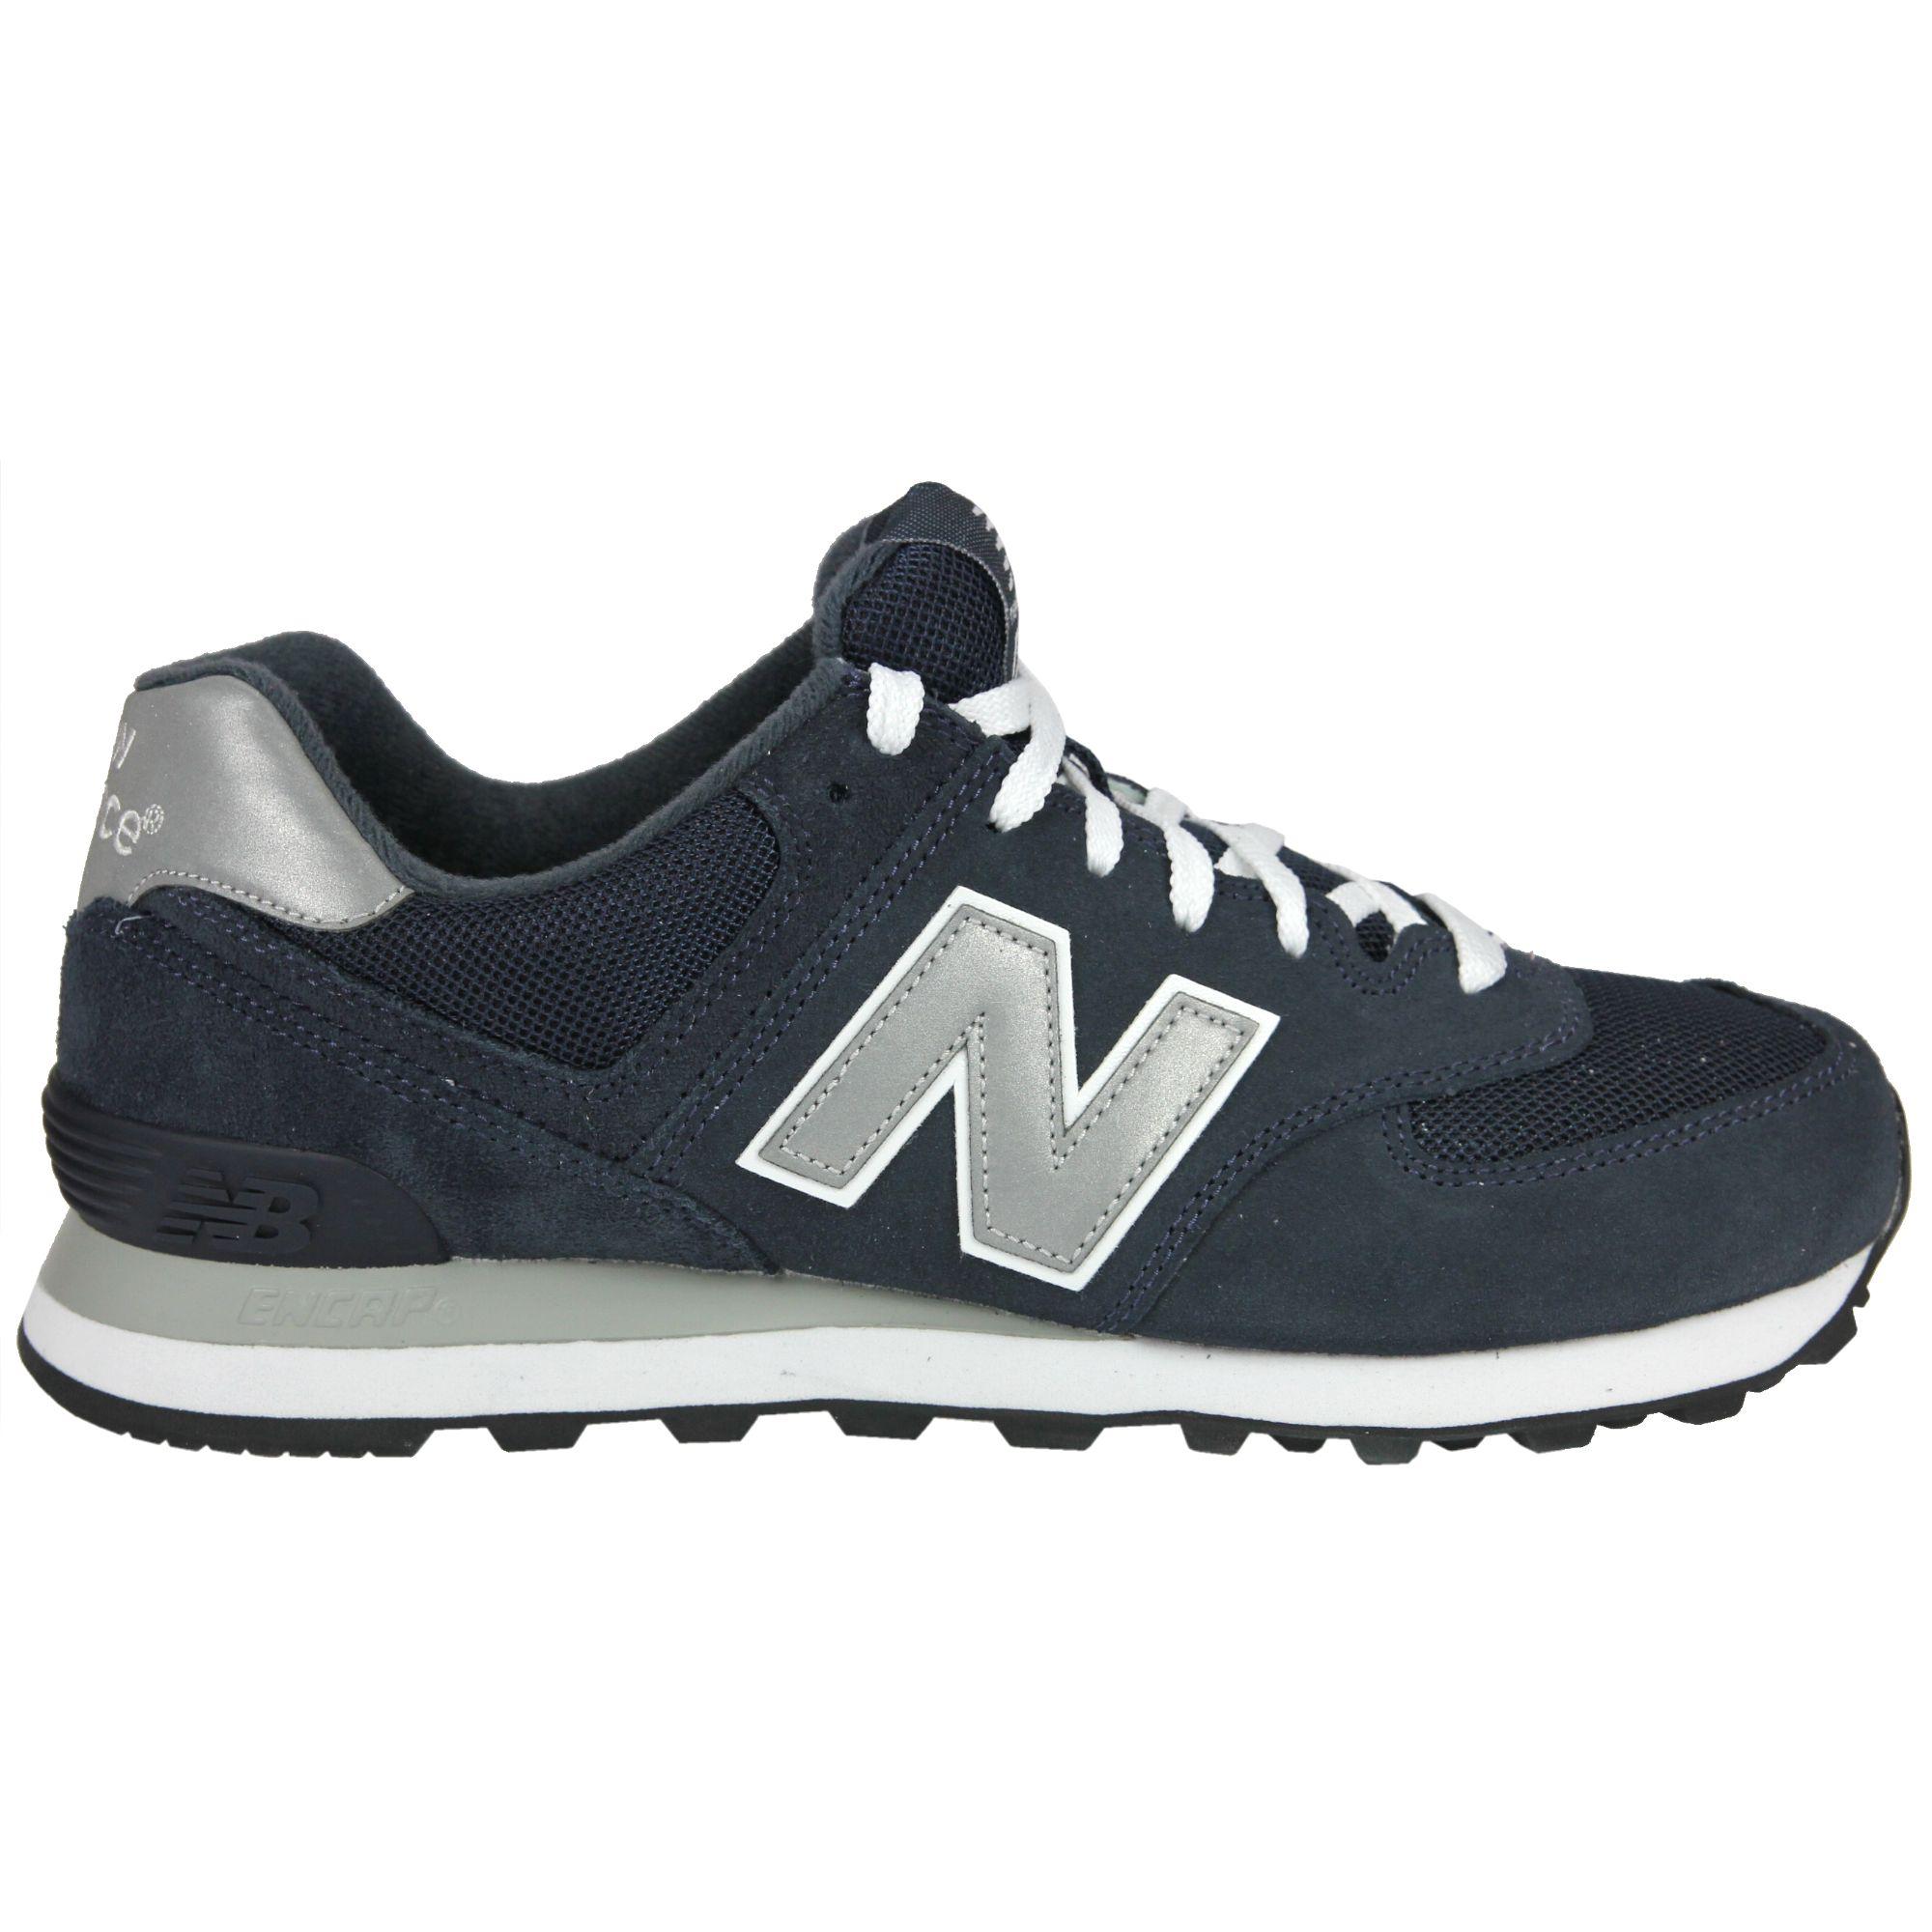 new balance m574 gs nn nk schuhe sneaker herren damen grau. Black Bedroom Furniture Sets. Home Design Ideas